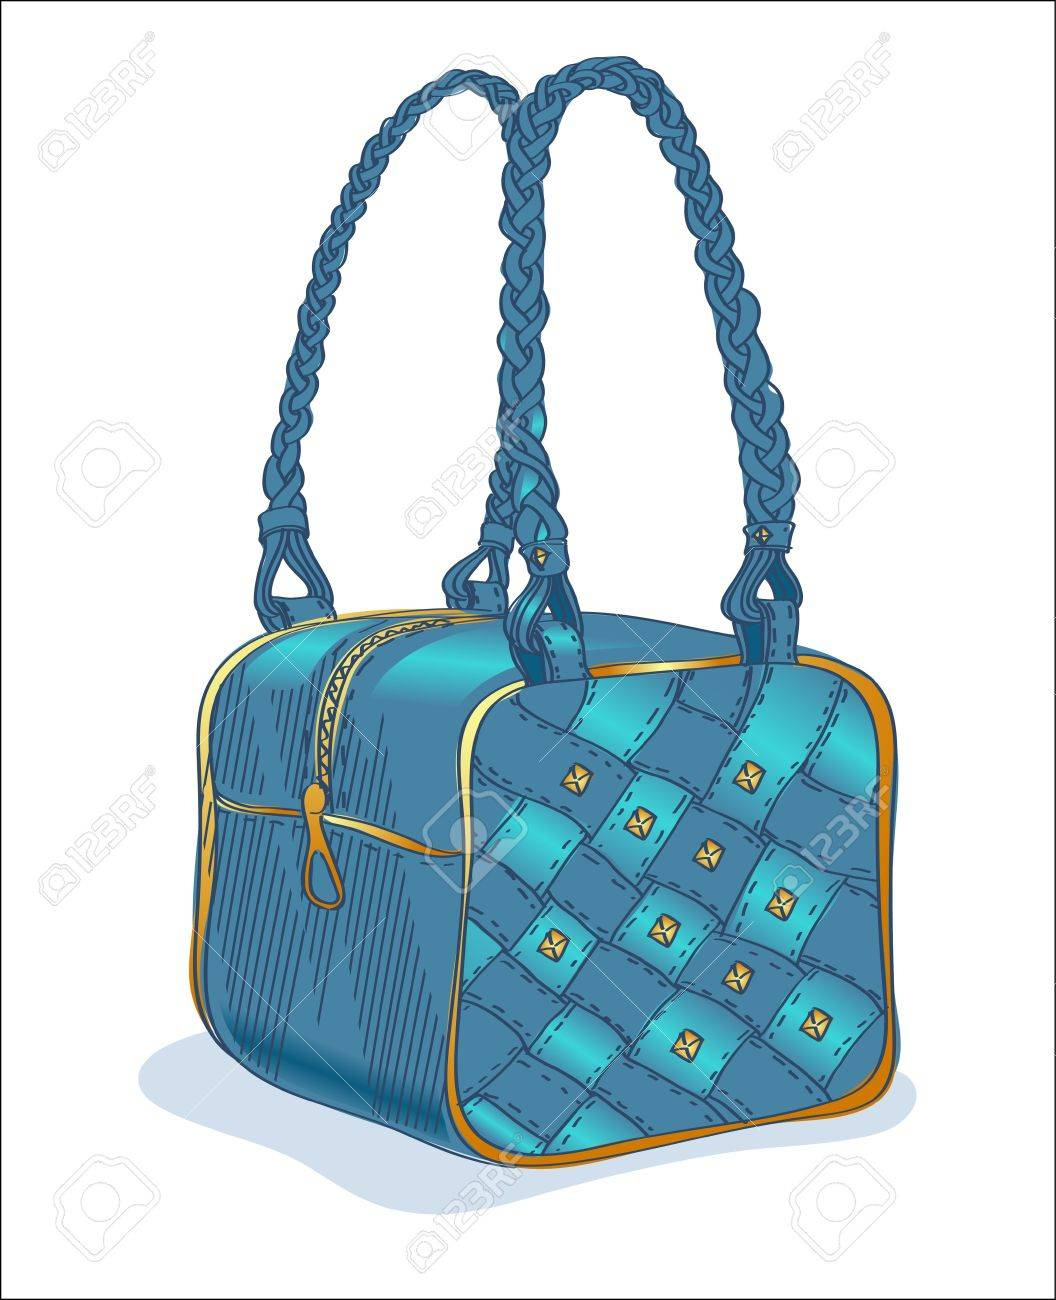 Sketch of a denim blue handbag Stock Vector - 12835378